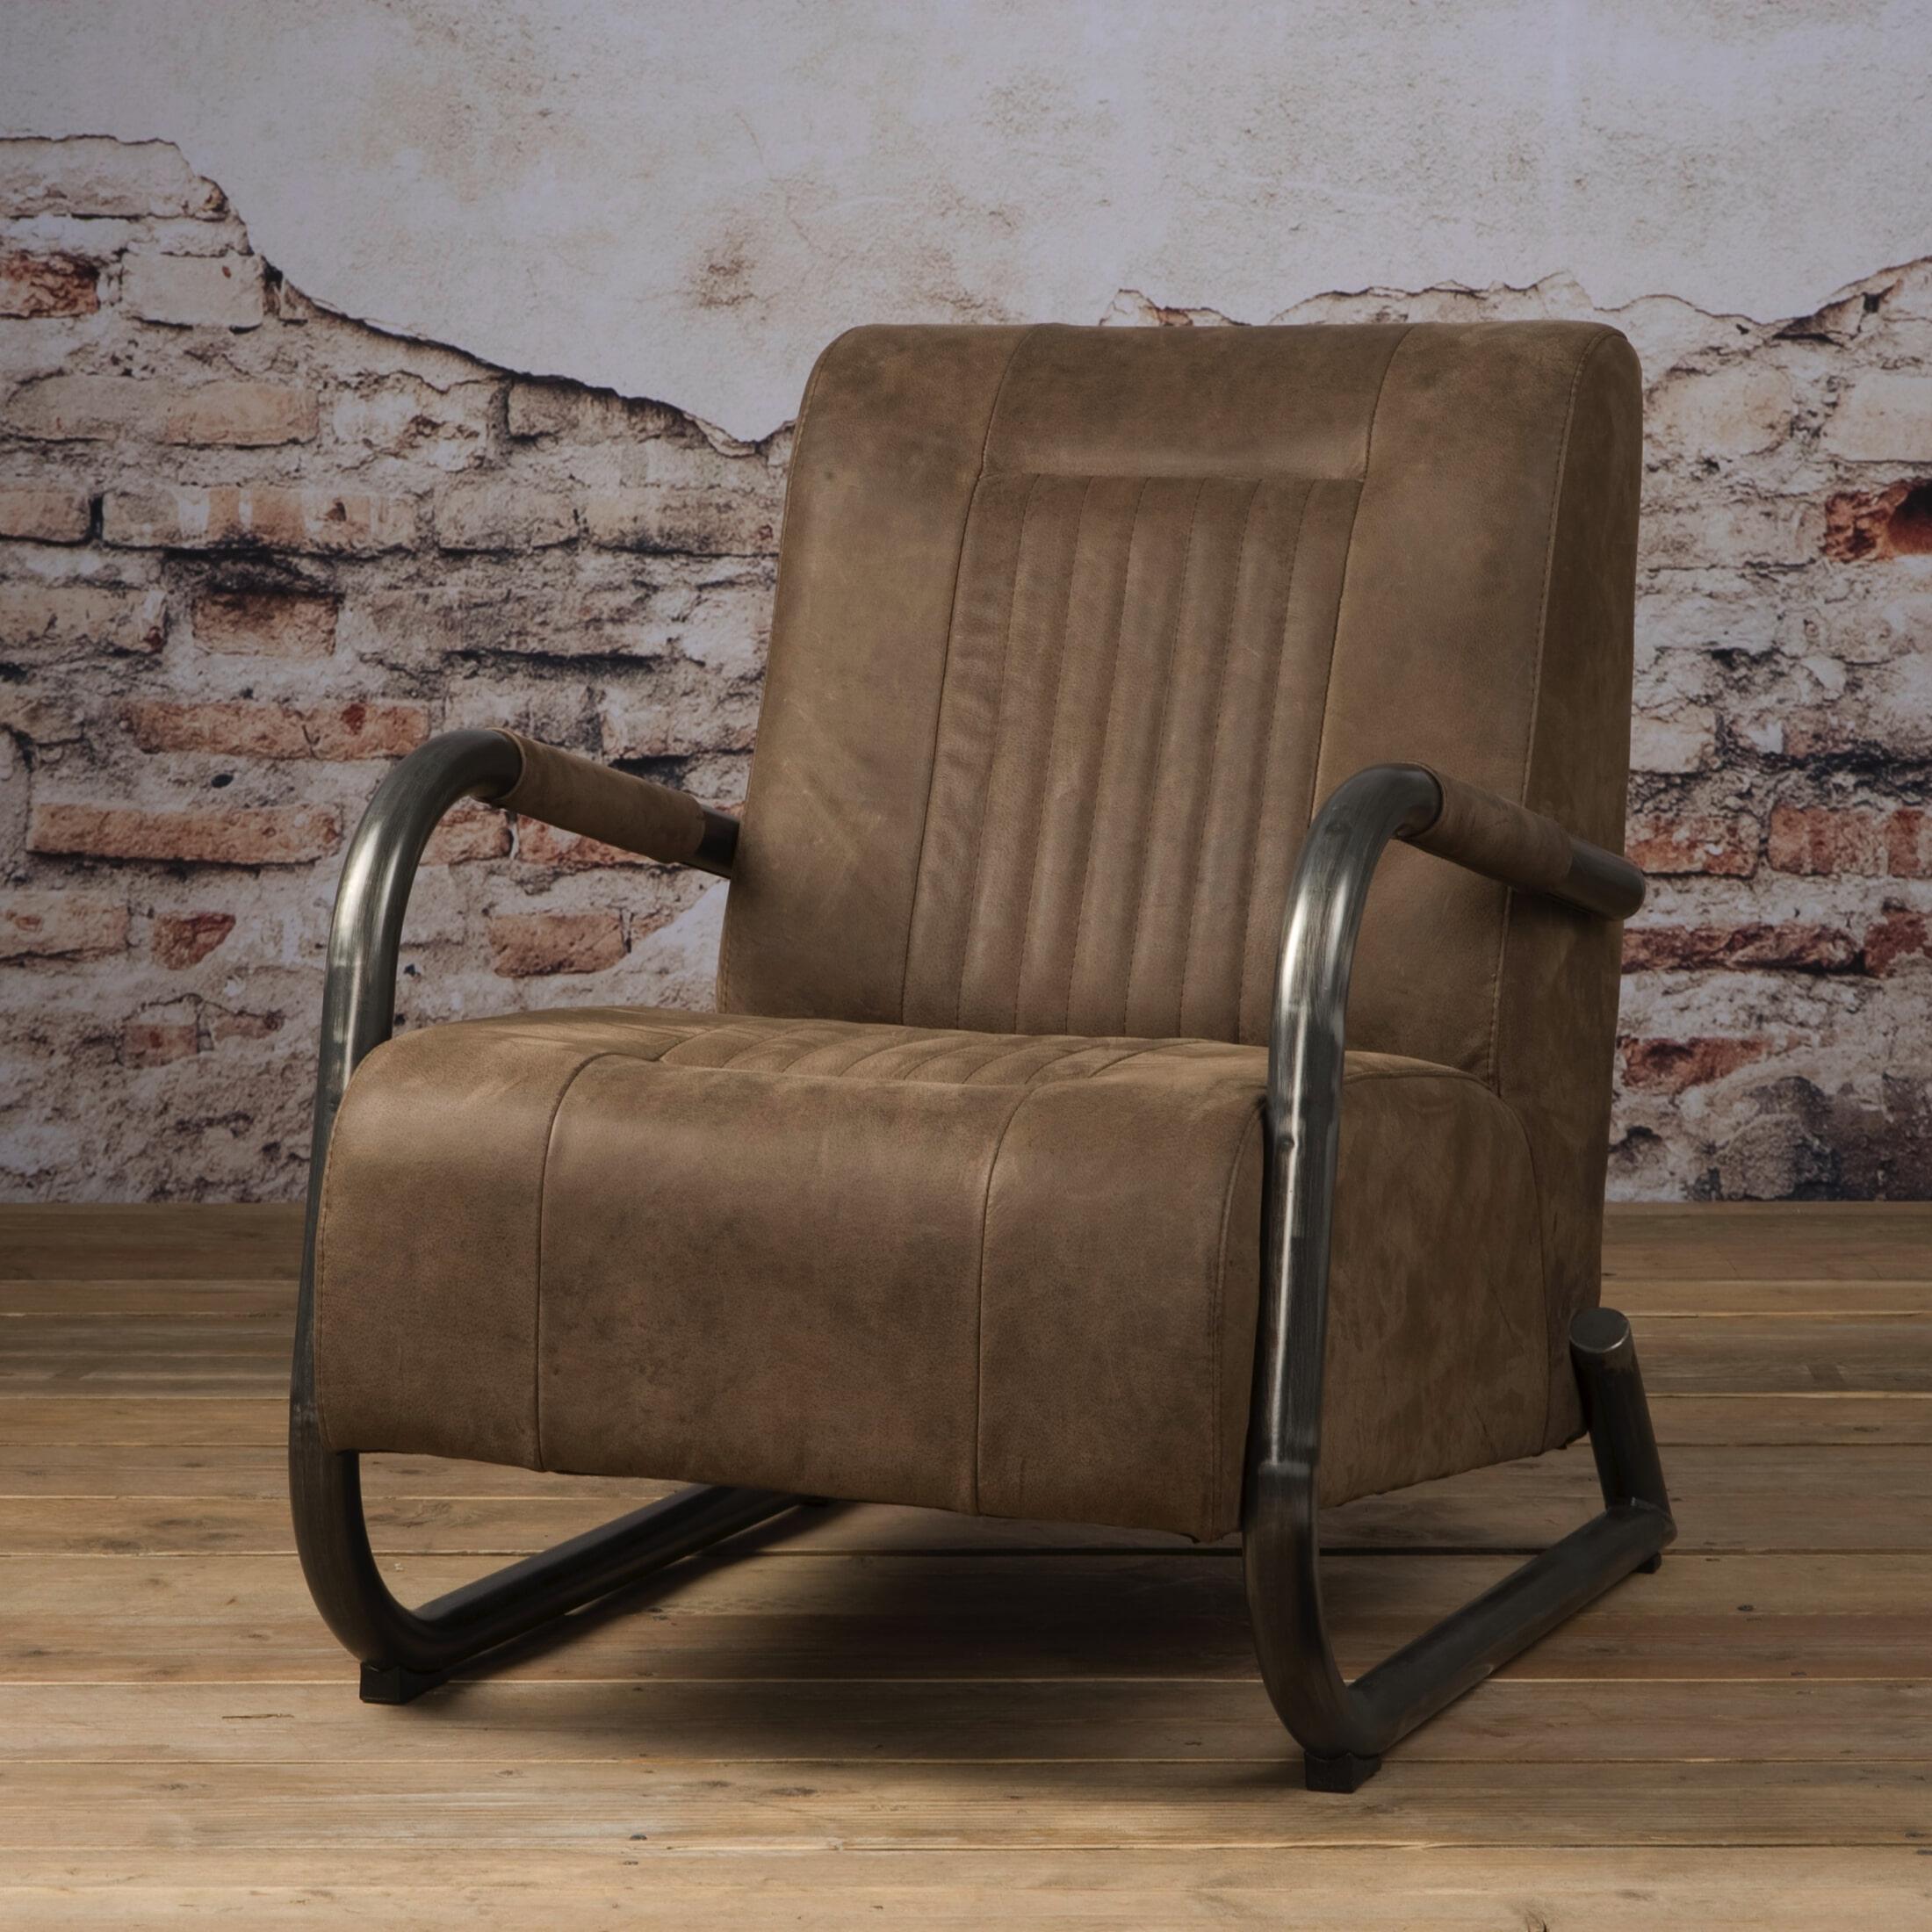 Tower Living fauteuil 'Barn' Leder, kleur Danza Taupe